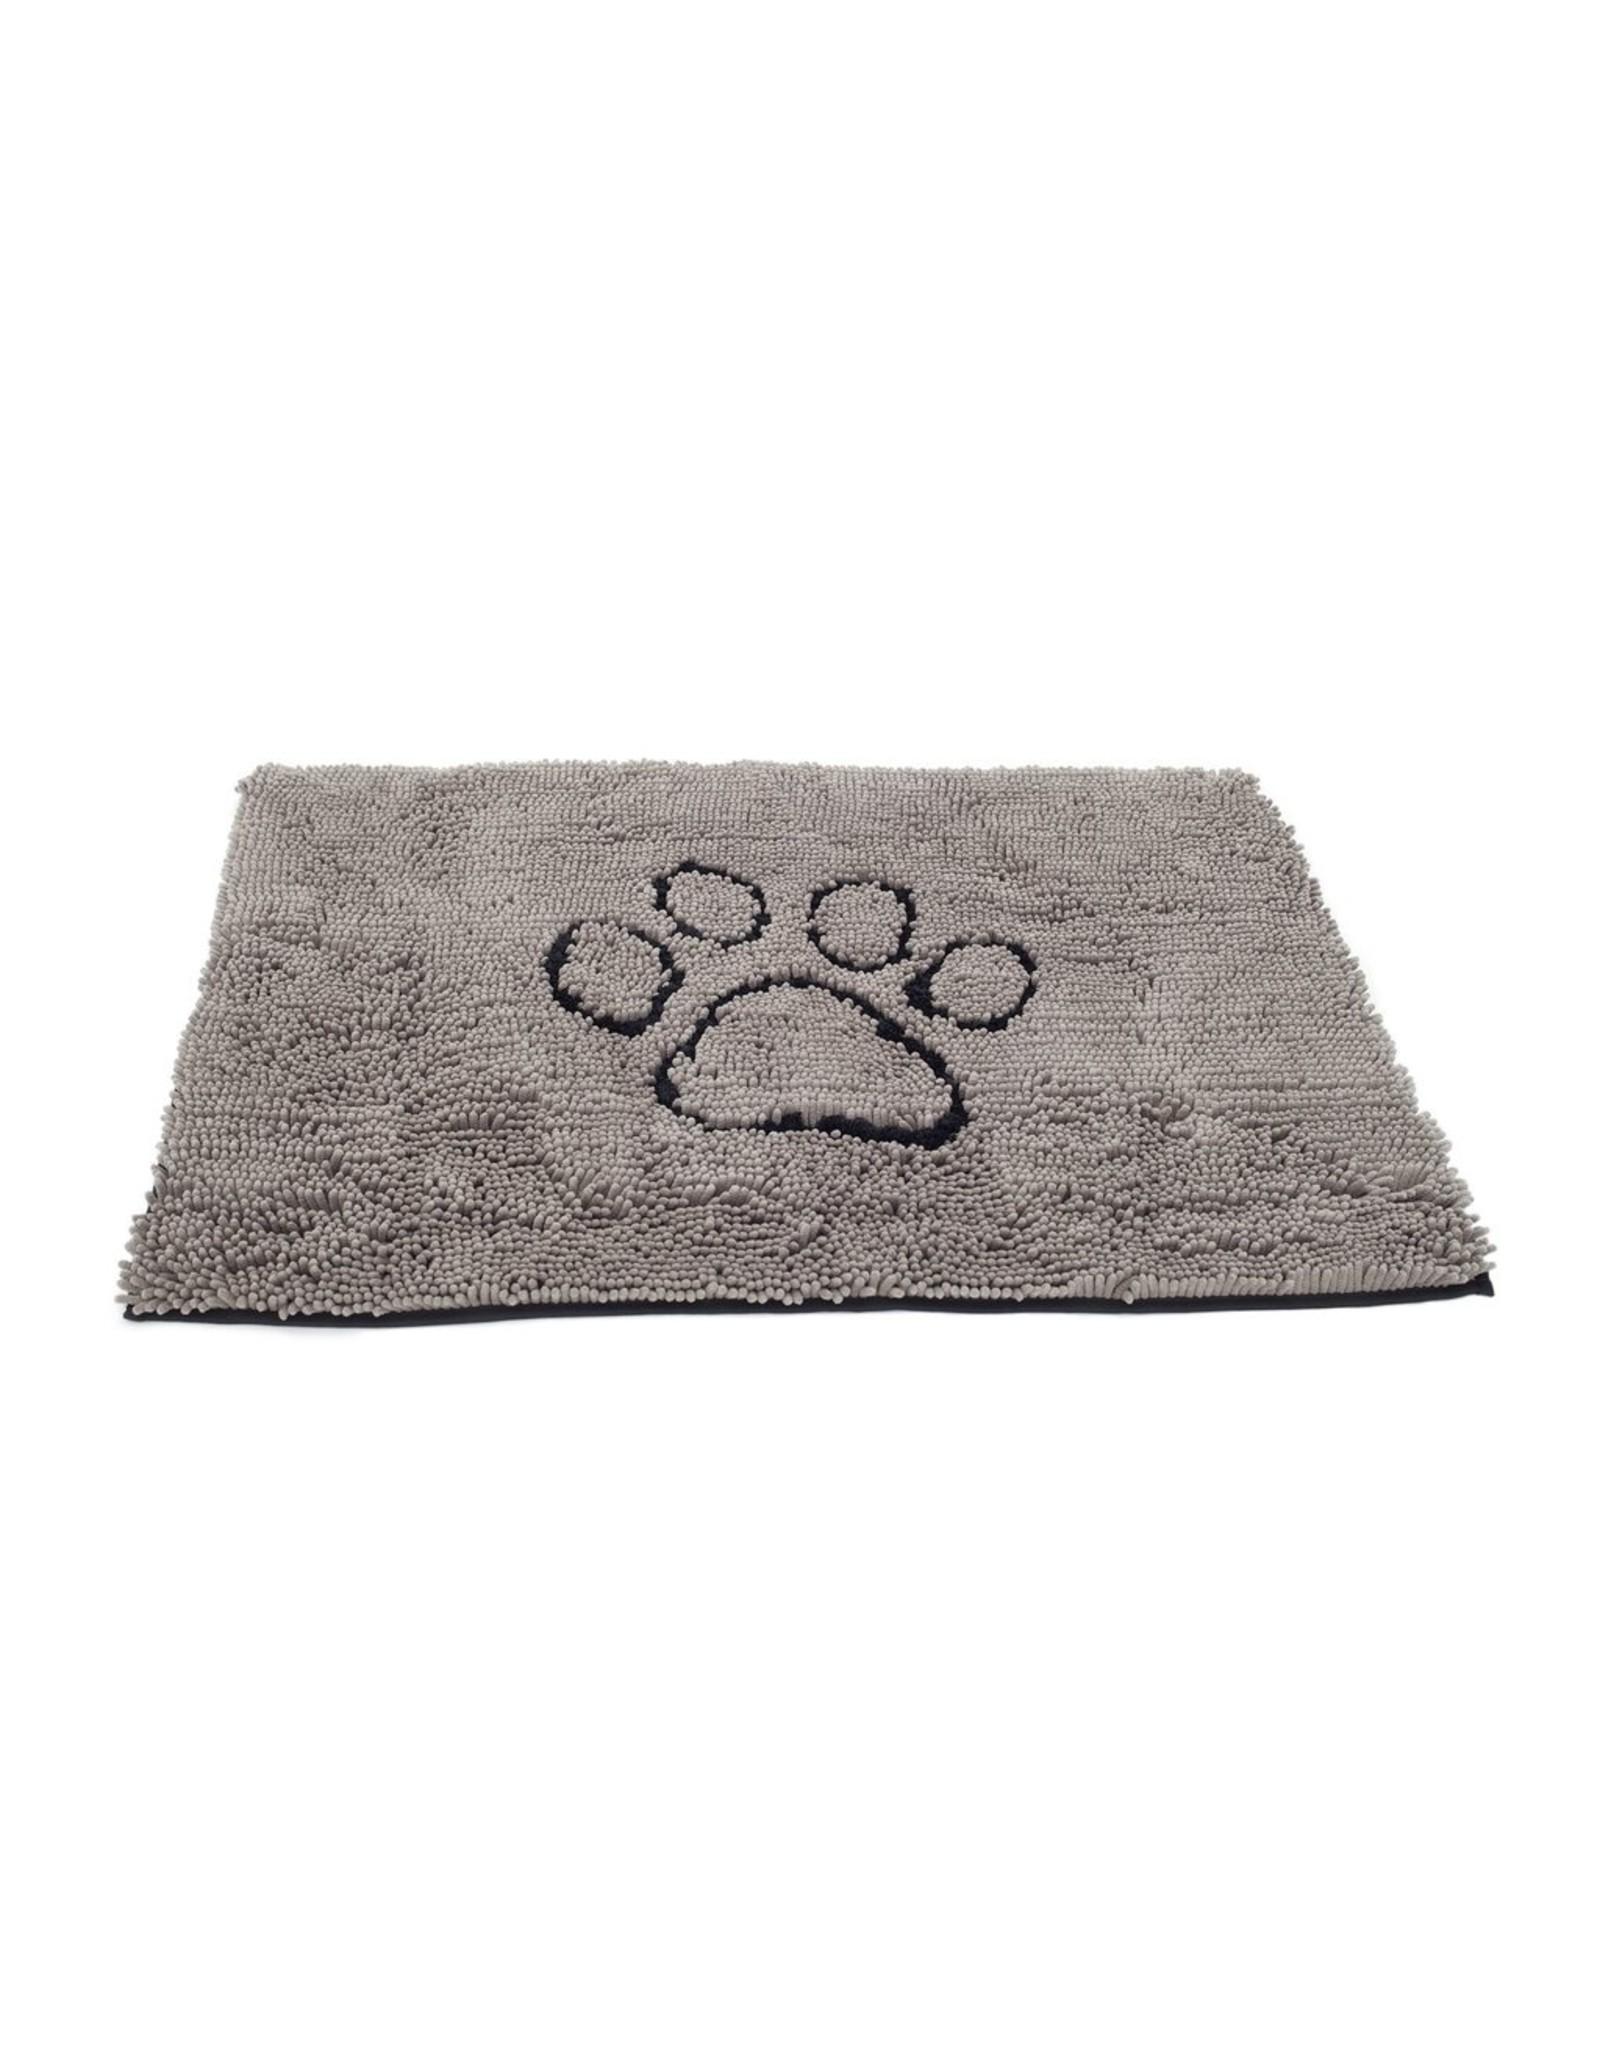 "DGS Pet Products Dirty Dog Doormat Super Absorbent Rug Medium 31"" x 20"""